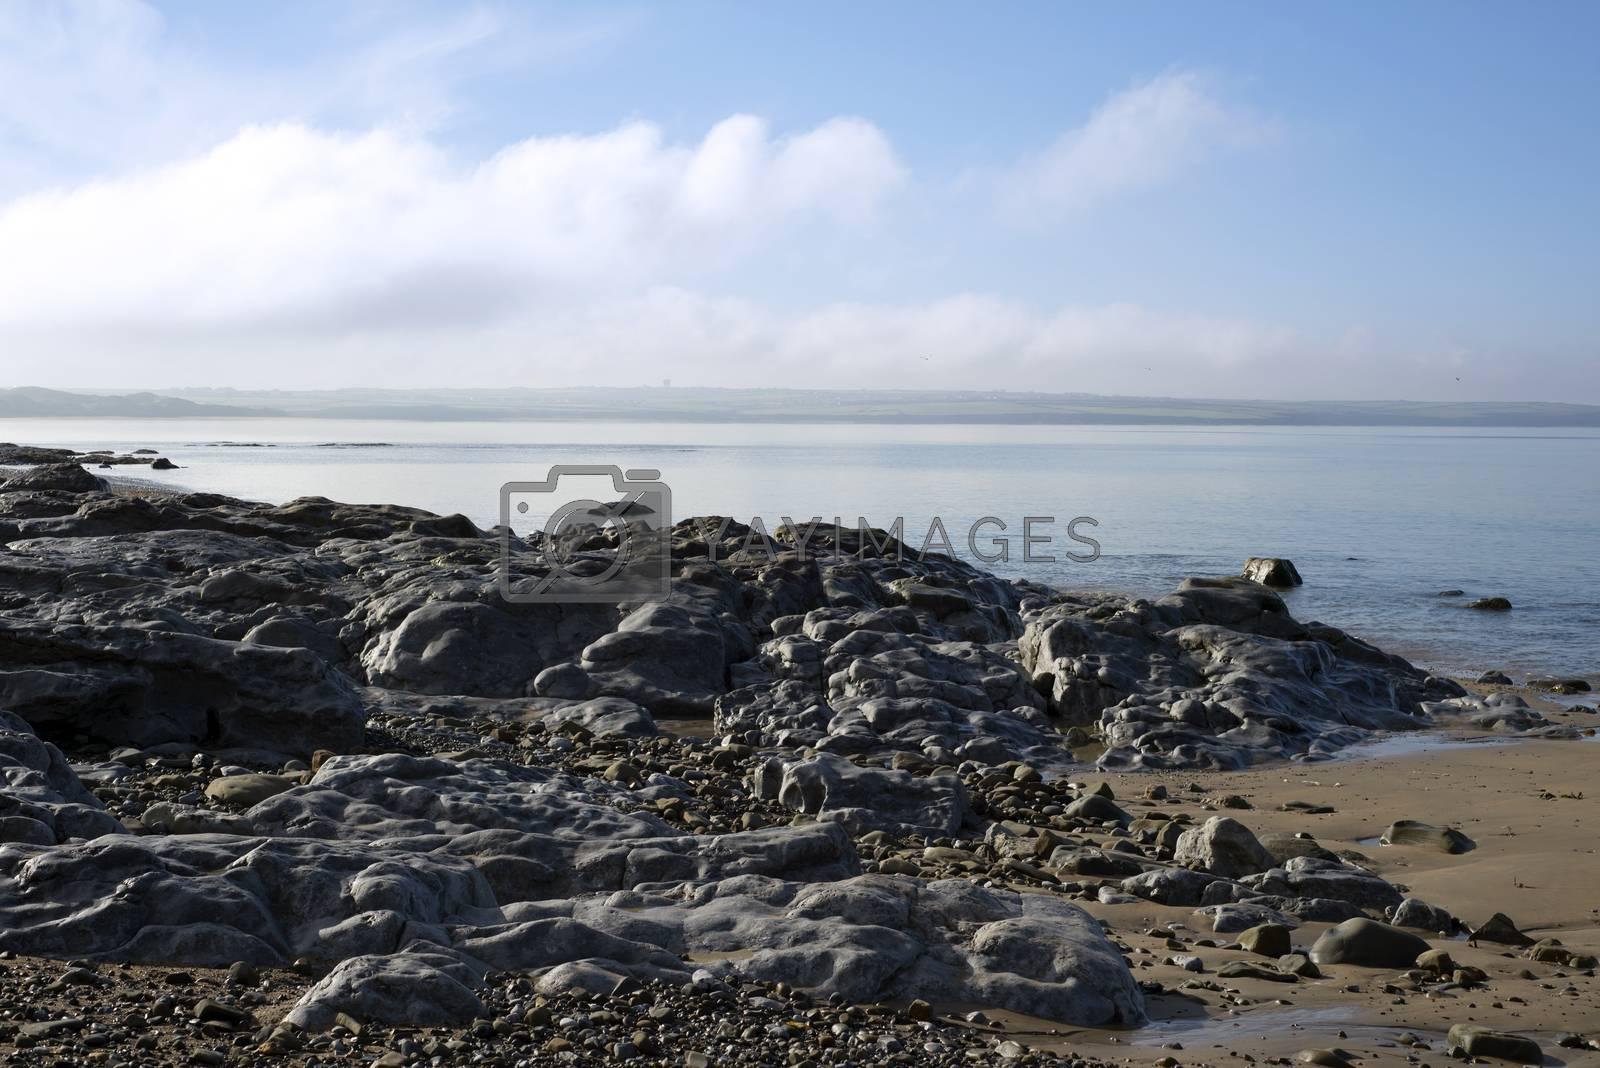 beautiful soft waves break on the black rocks at ballybunion beach in ireland